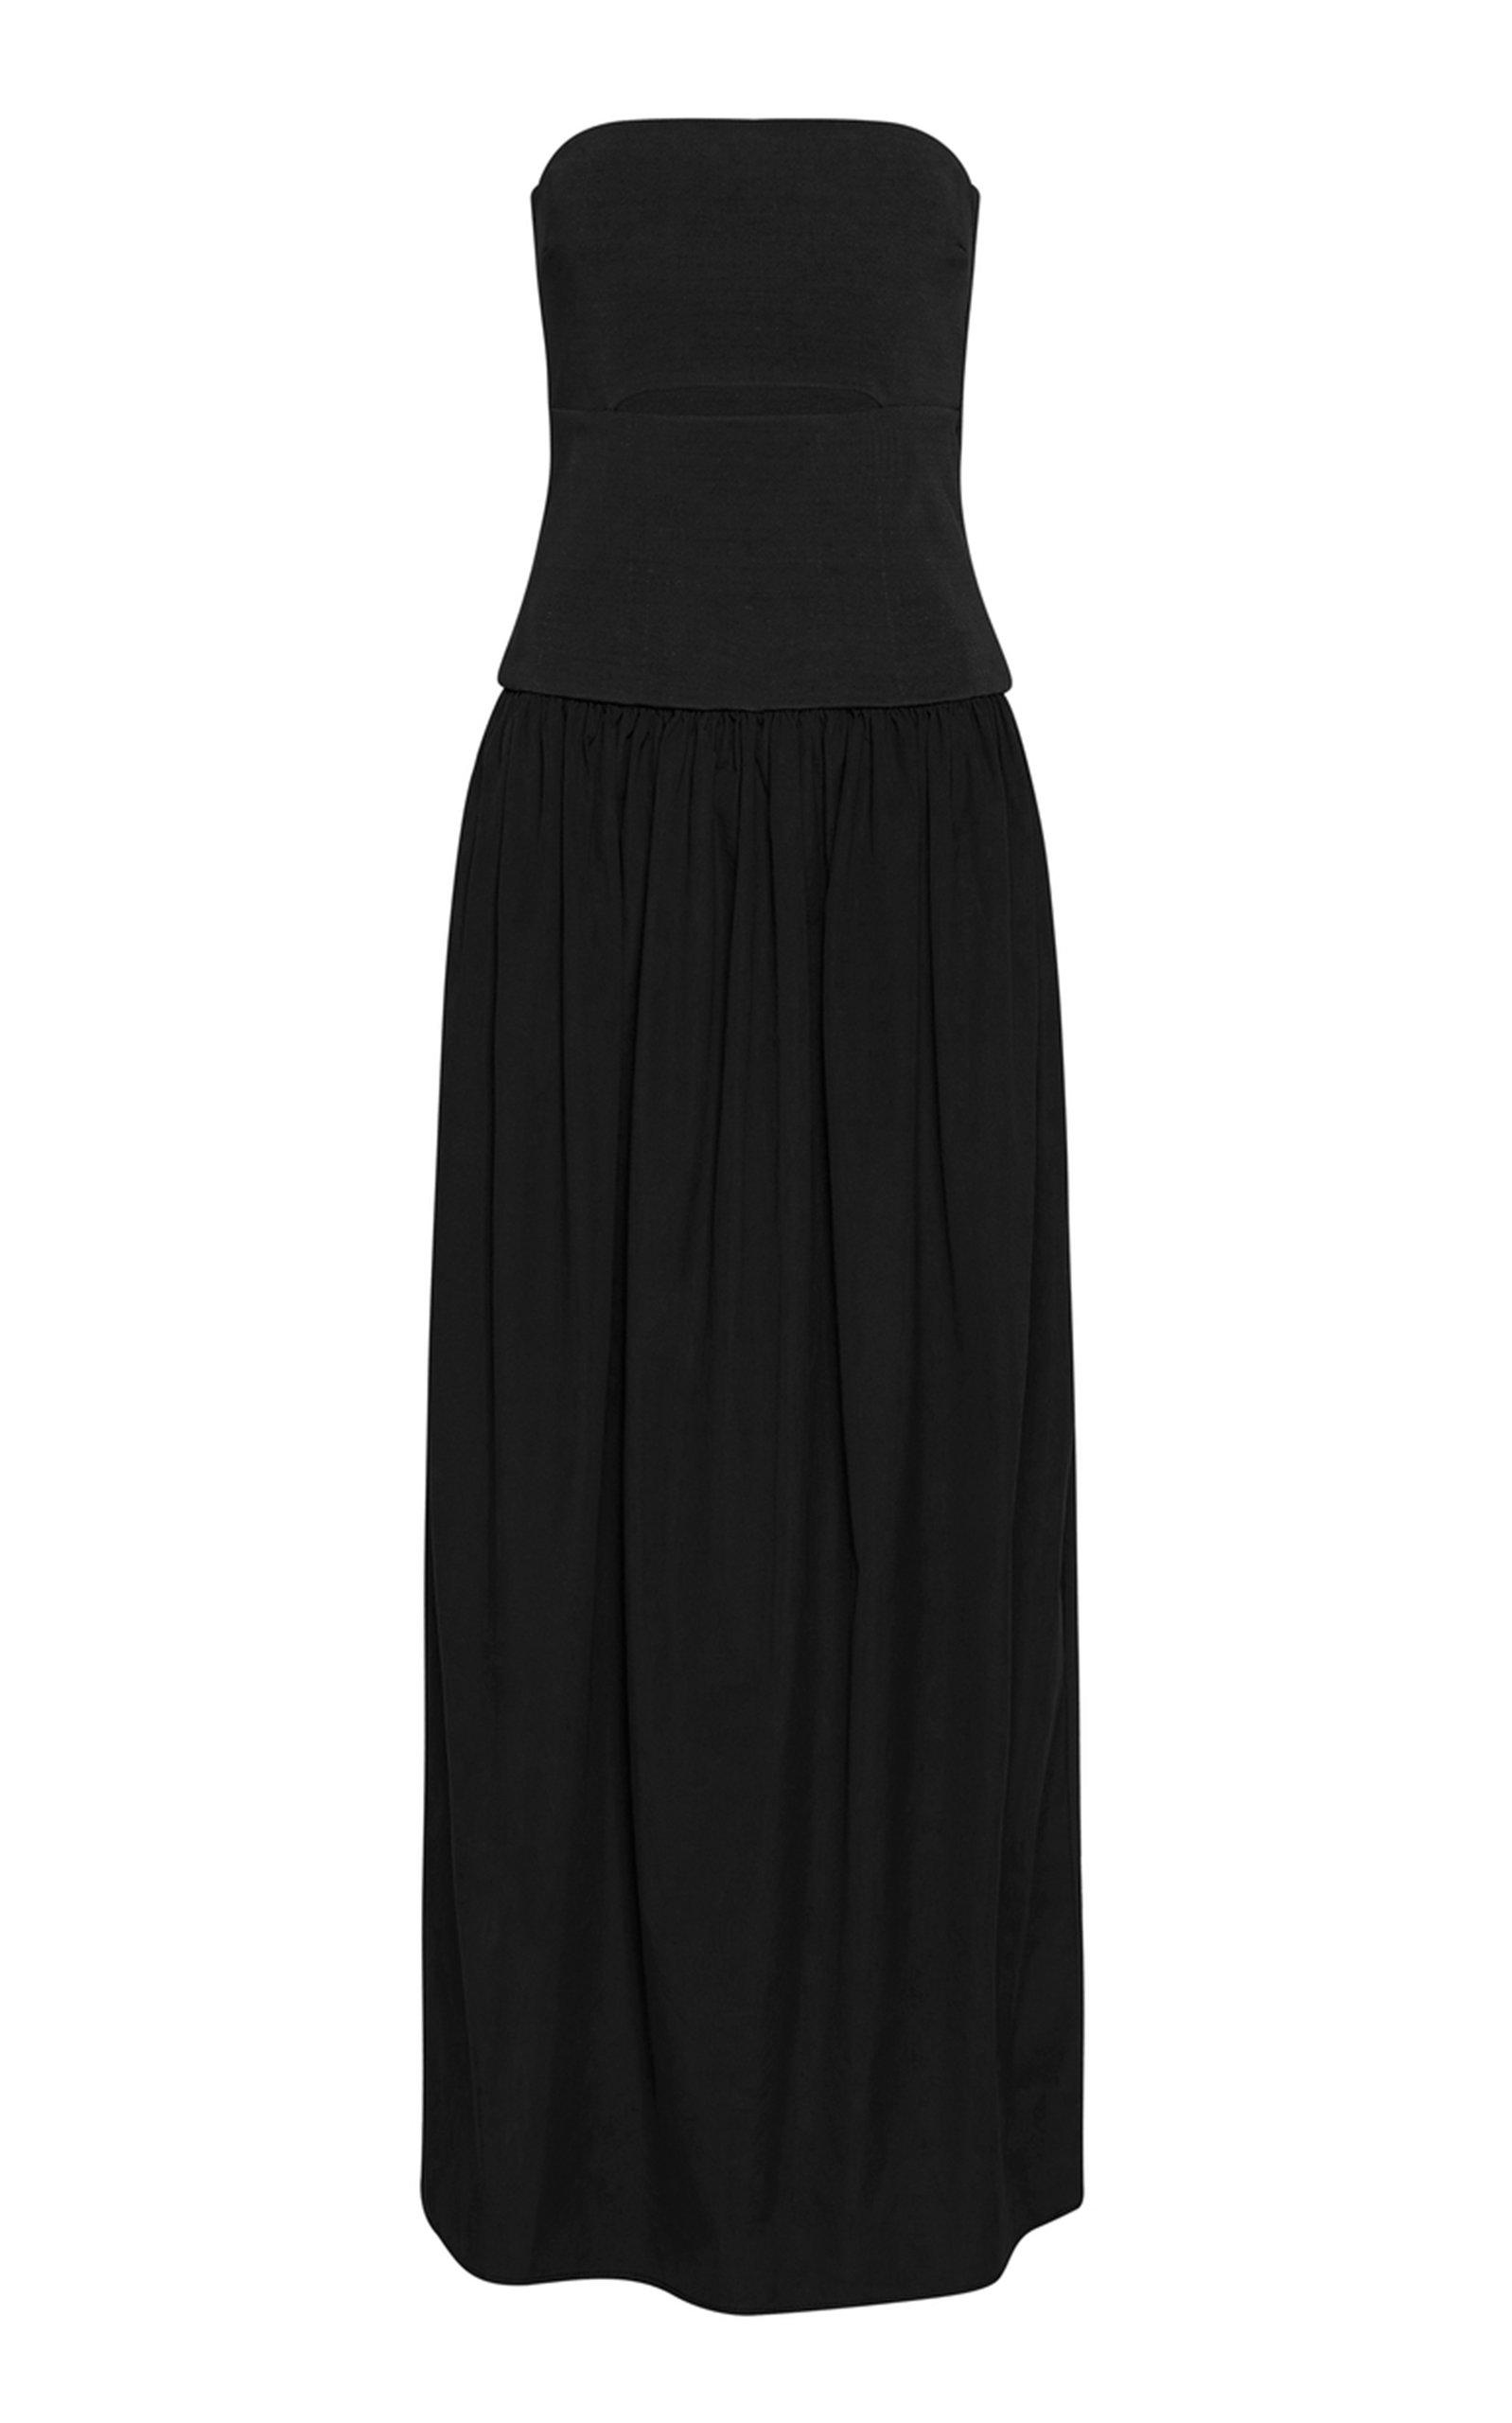 Women's Cutout Cotton Strapless Maxi Dress